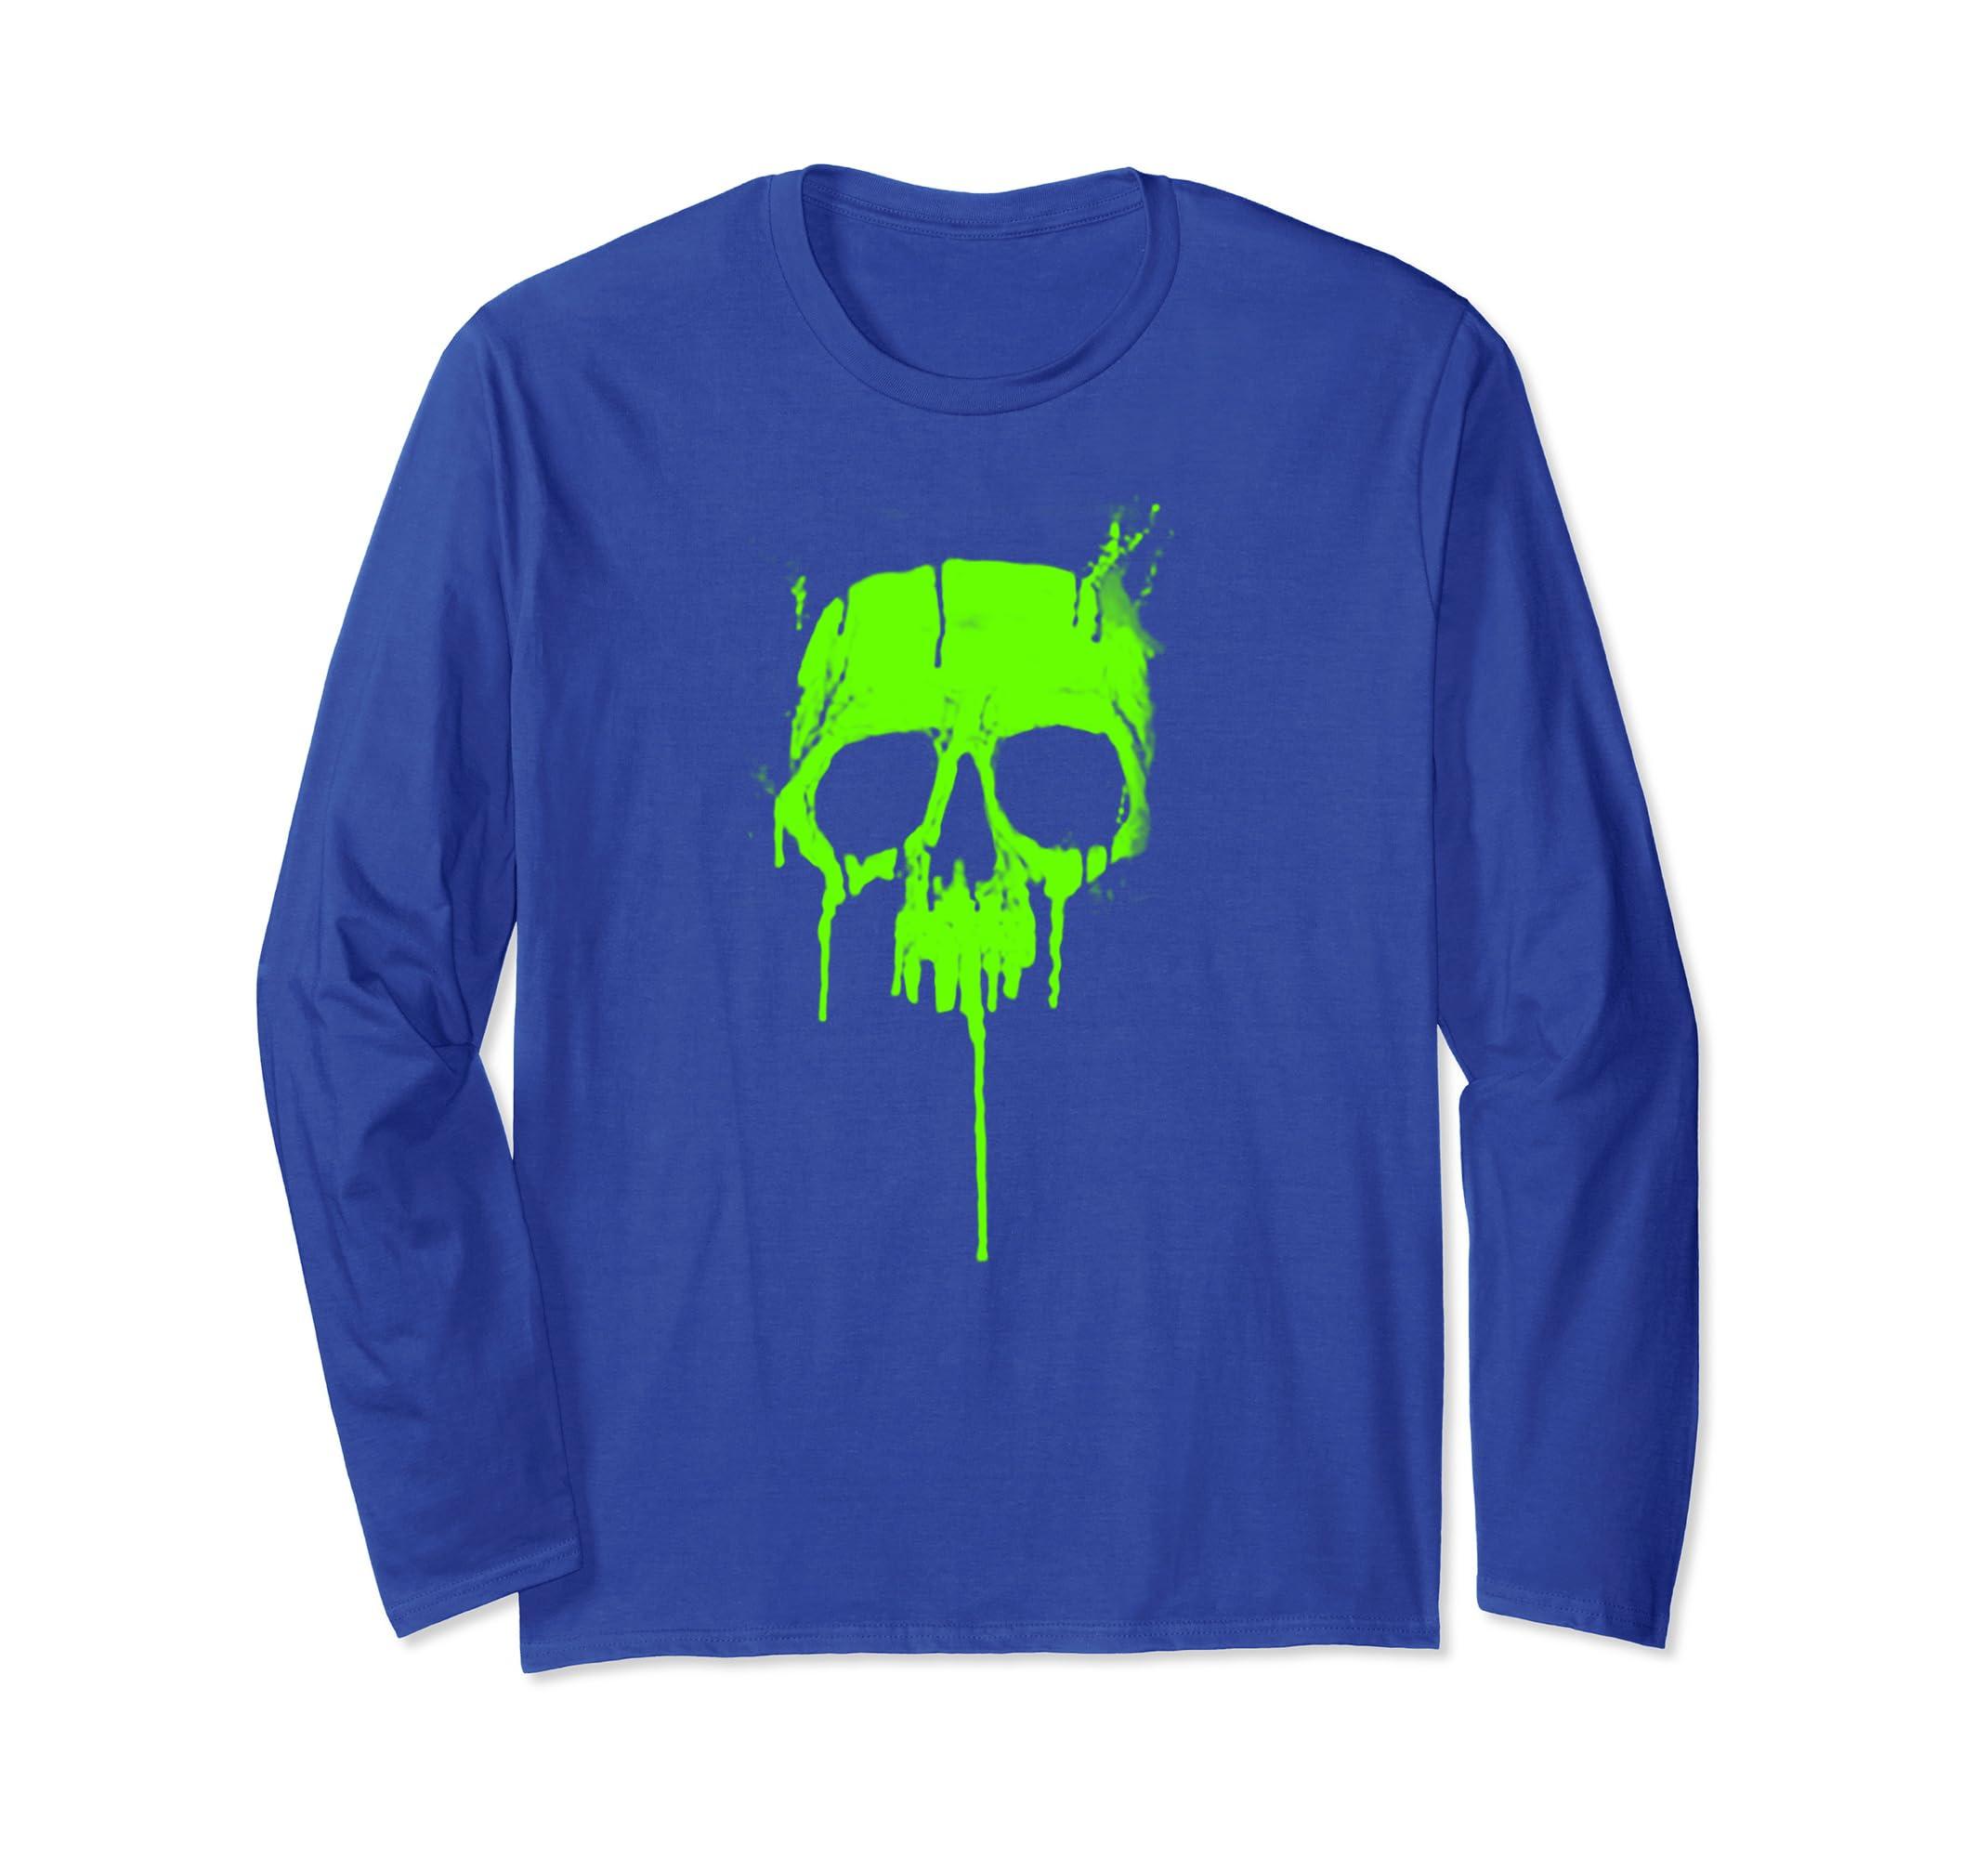 =Metal Graffiti Skull   Dripping Paint Long Sleeve Shirt-ln